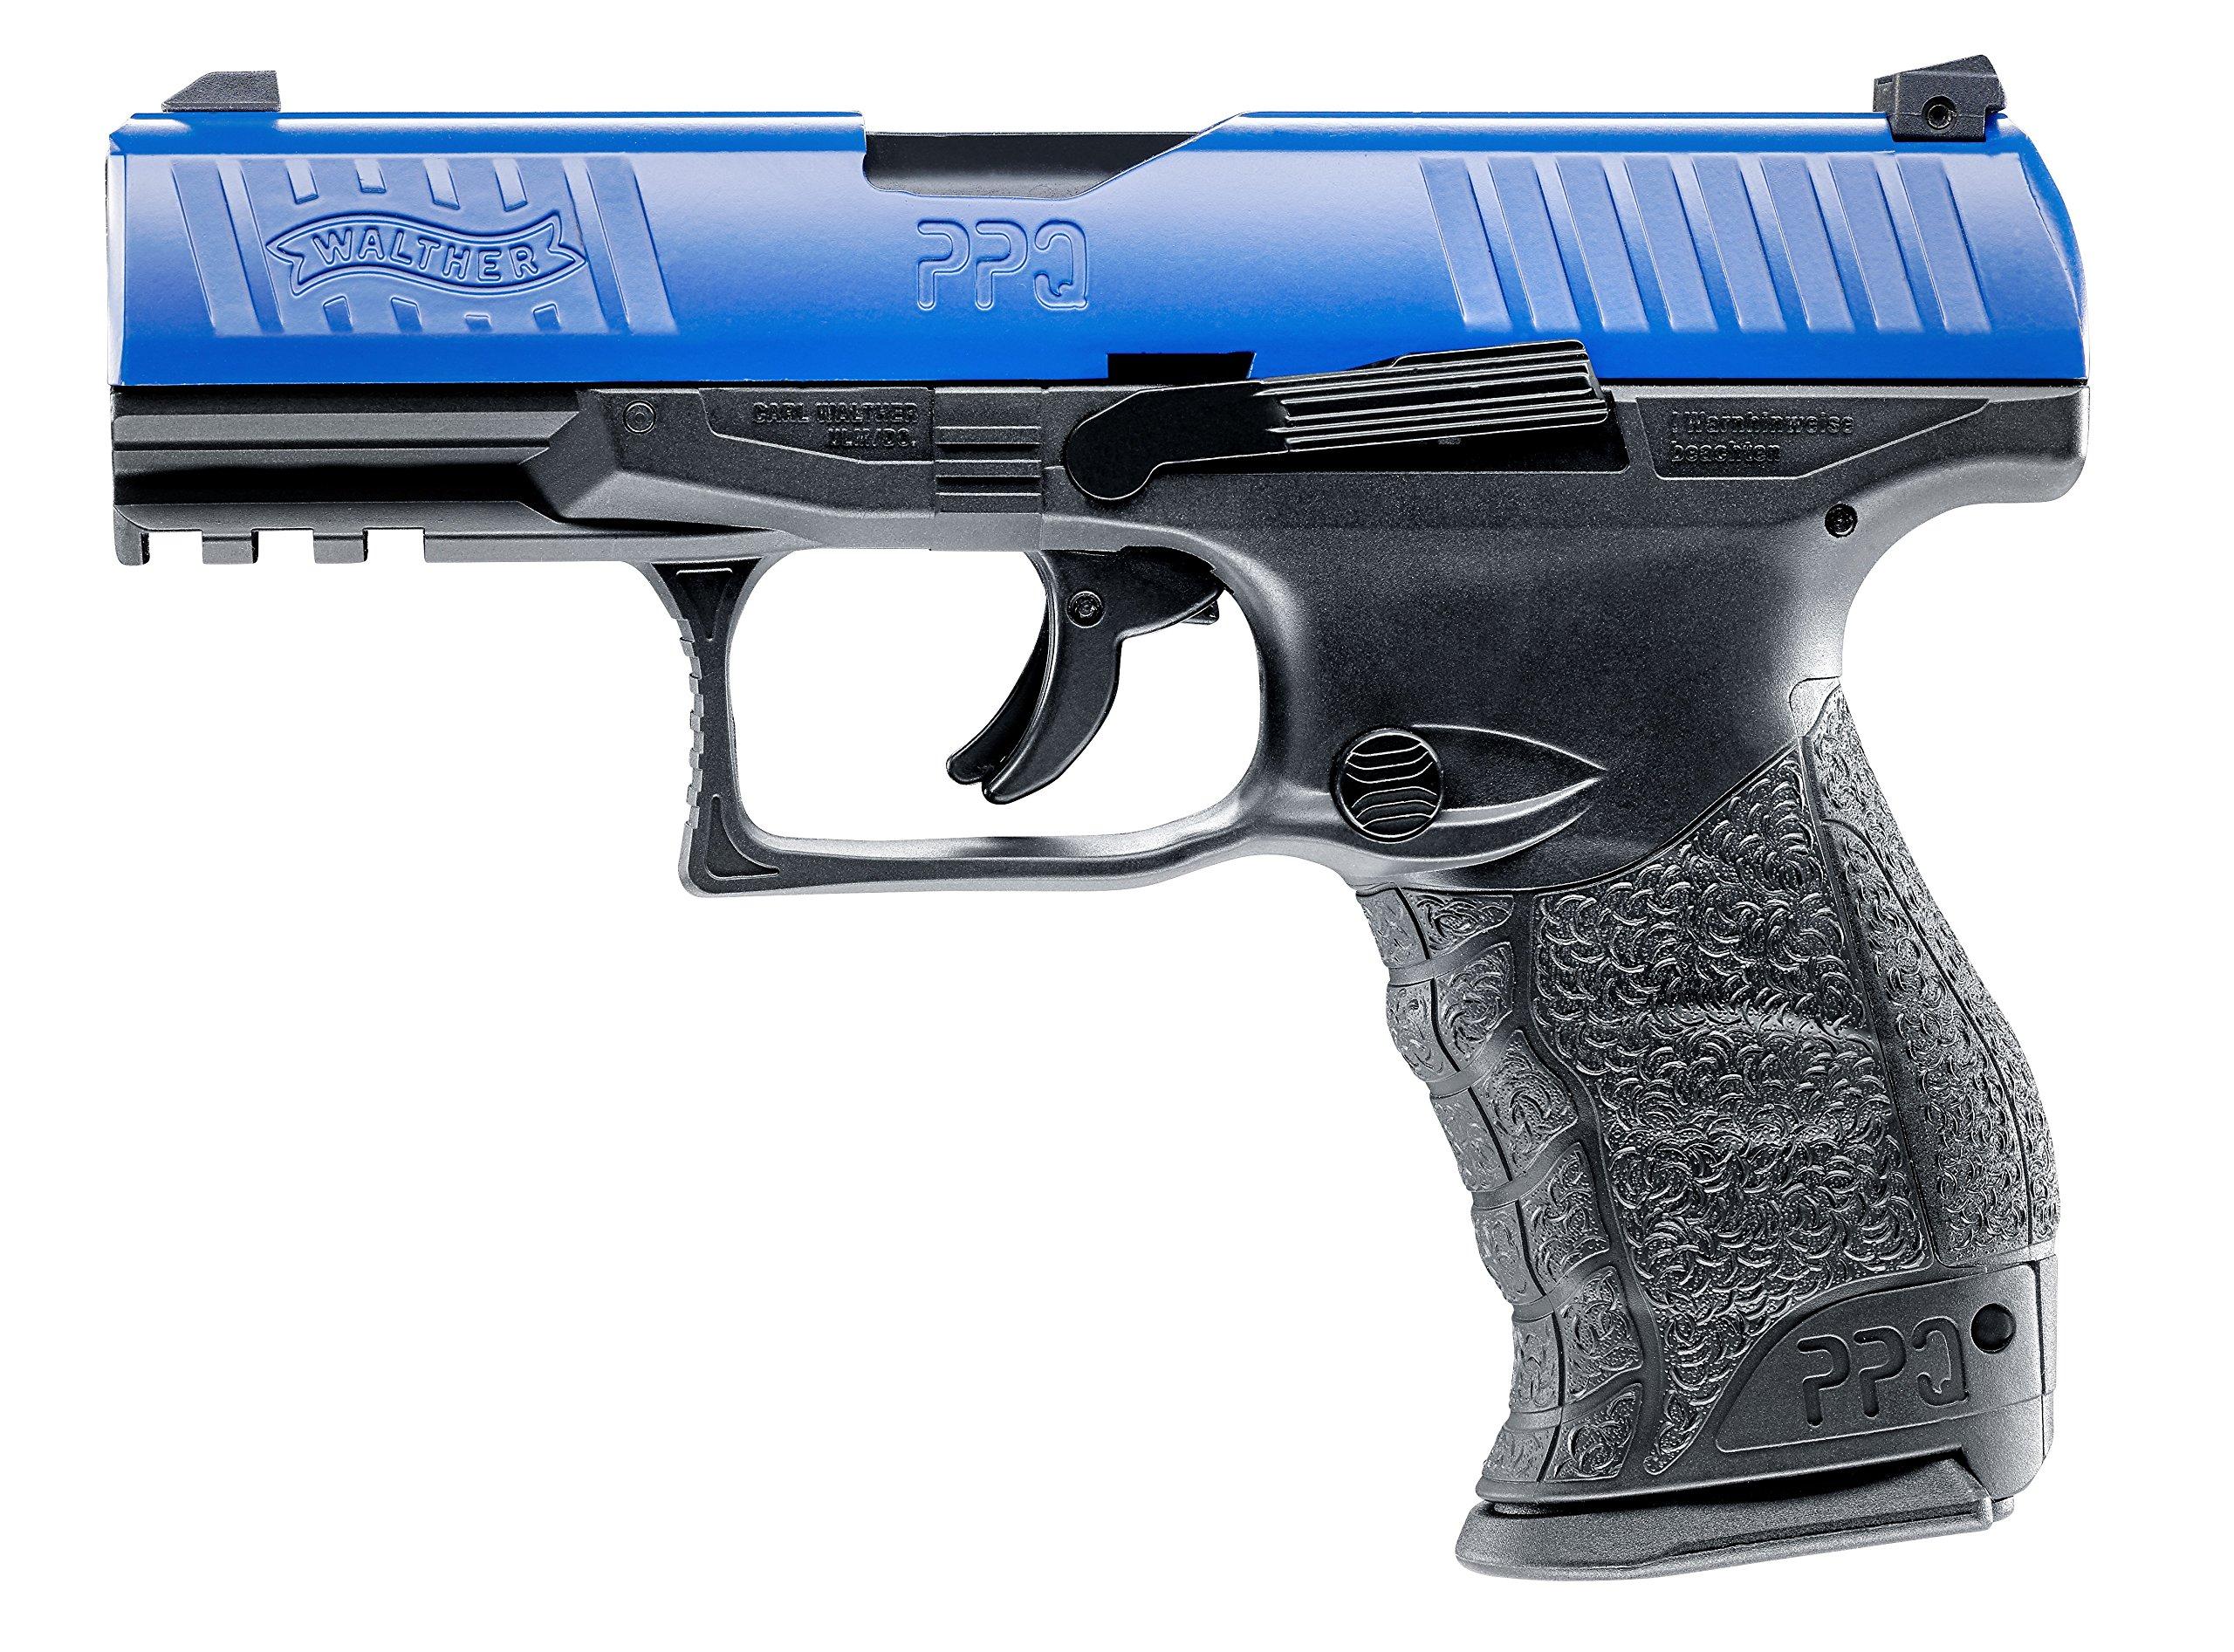 T4E .43cal Walther PPQ LE Paintball Pistol Law Enforcement Trainer semi auto